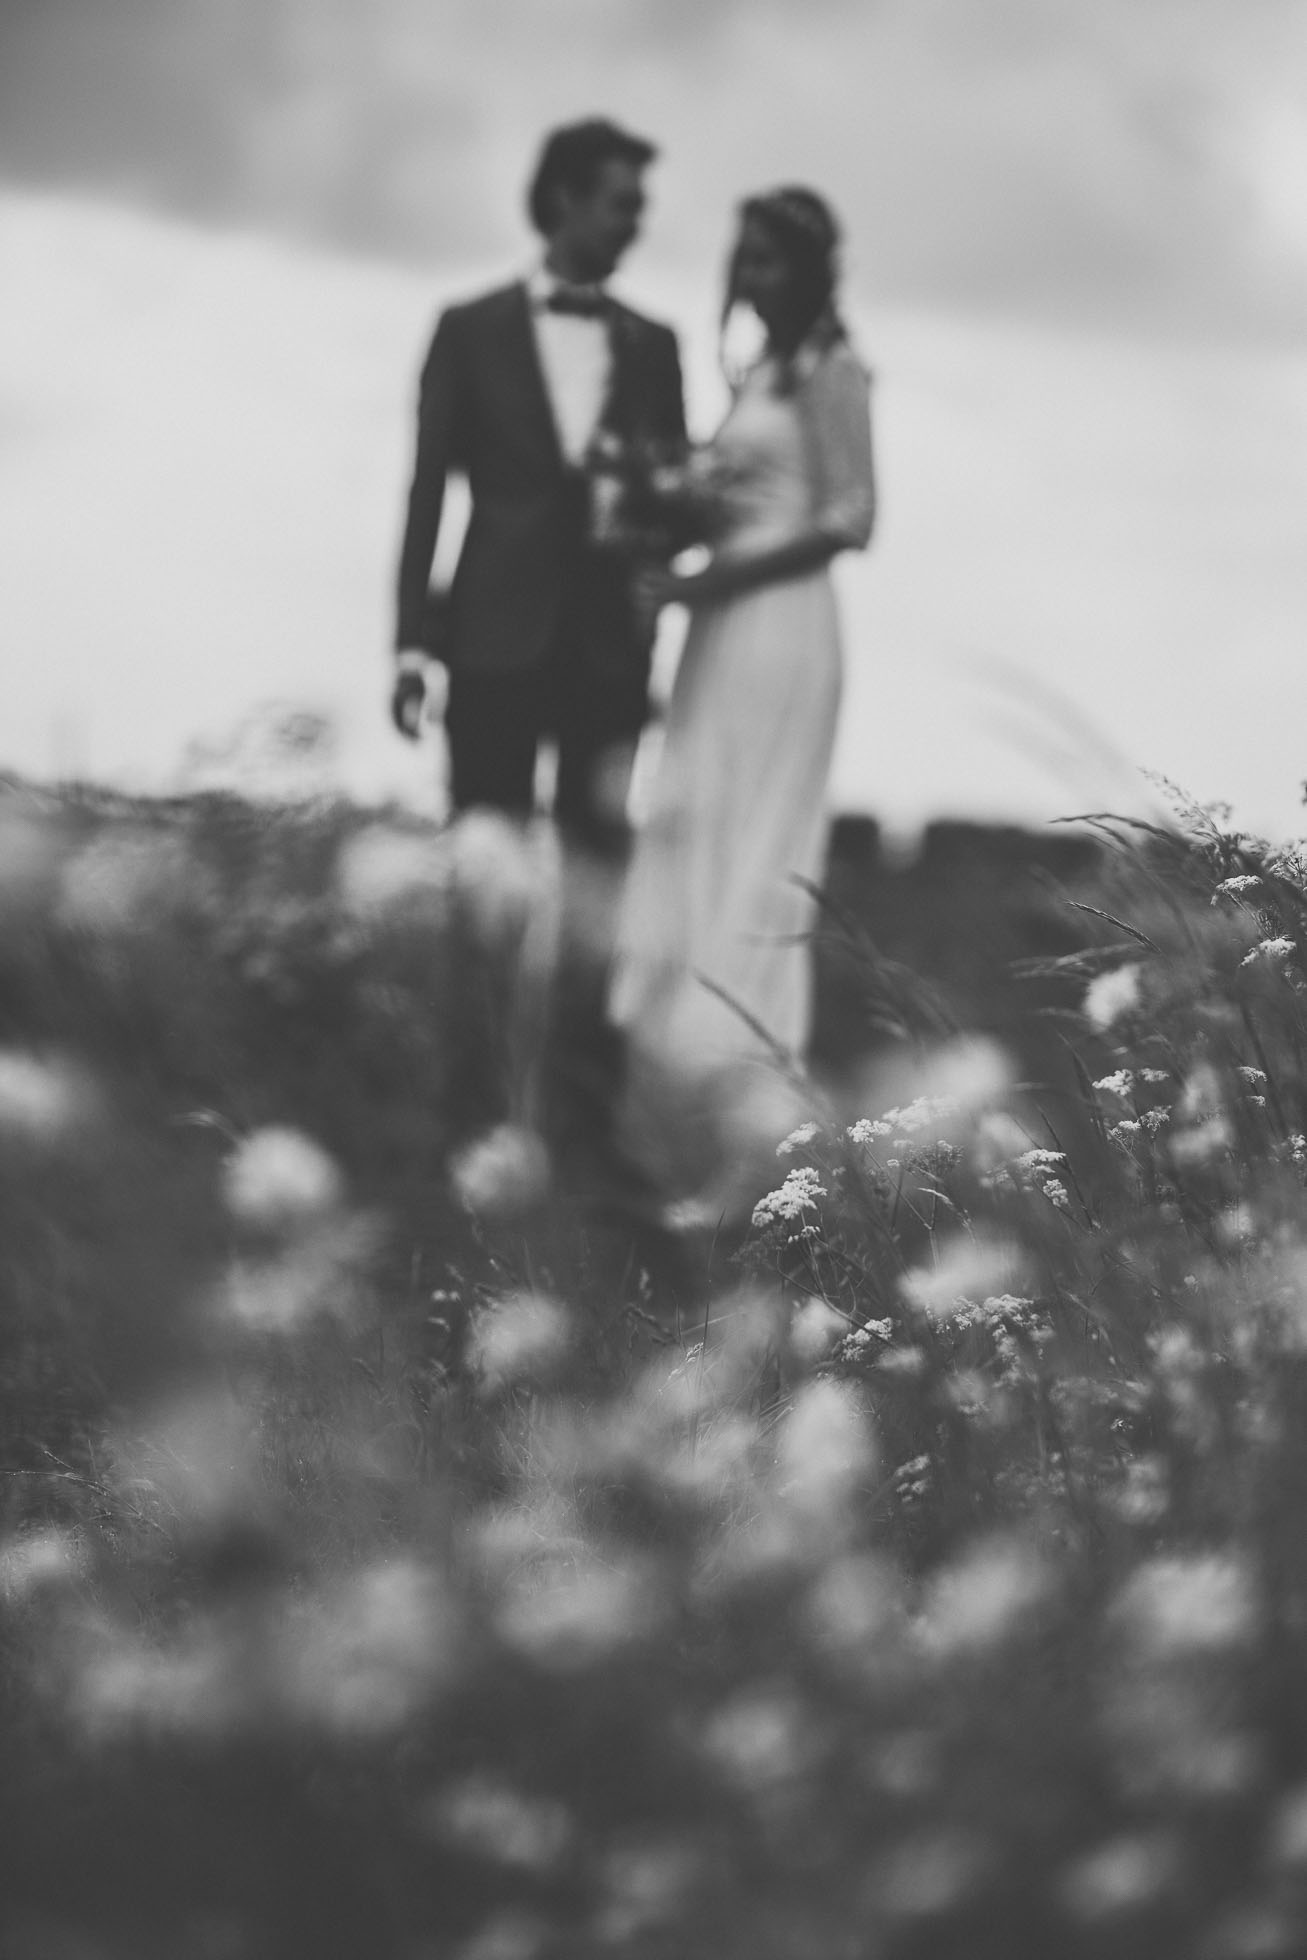 utrecht-wedding-photographer-31.jpg